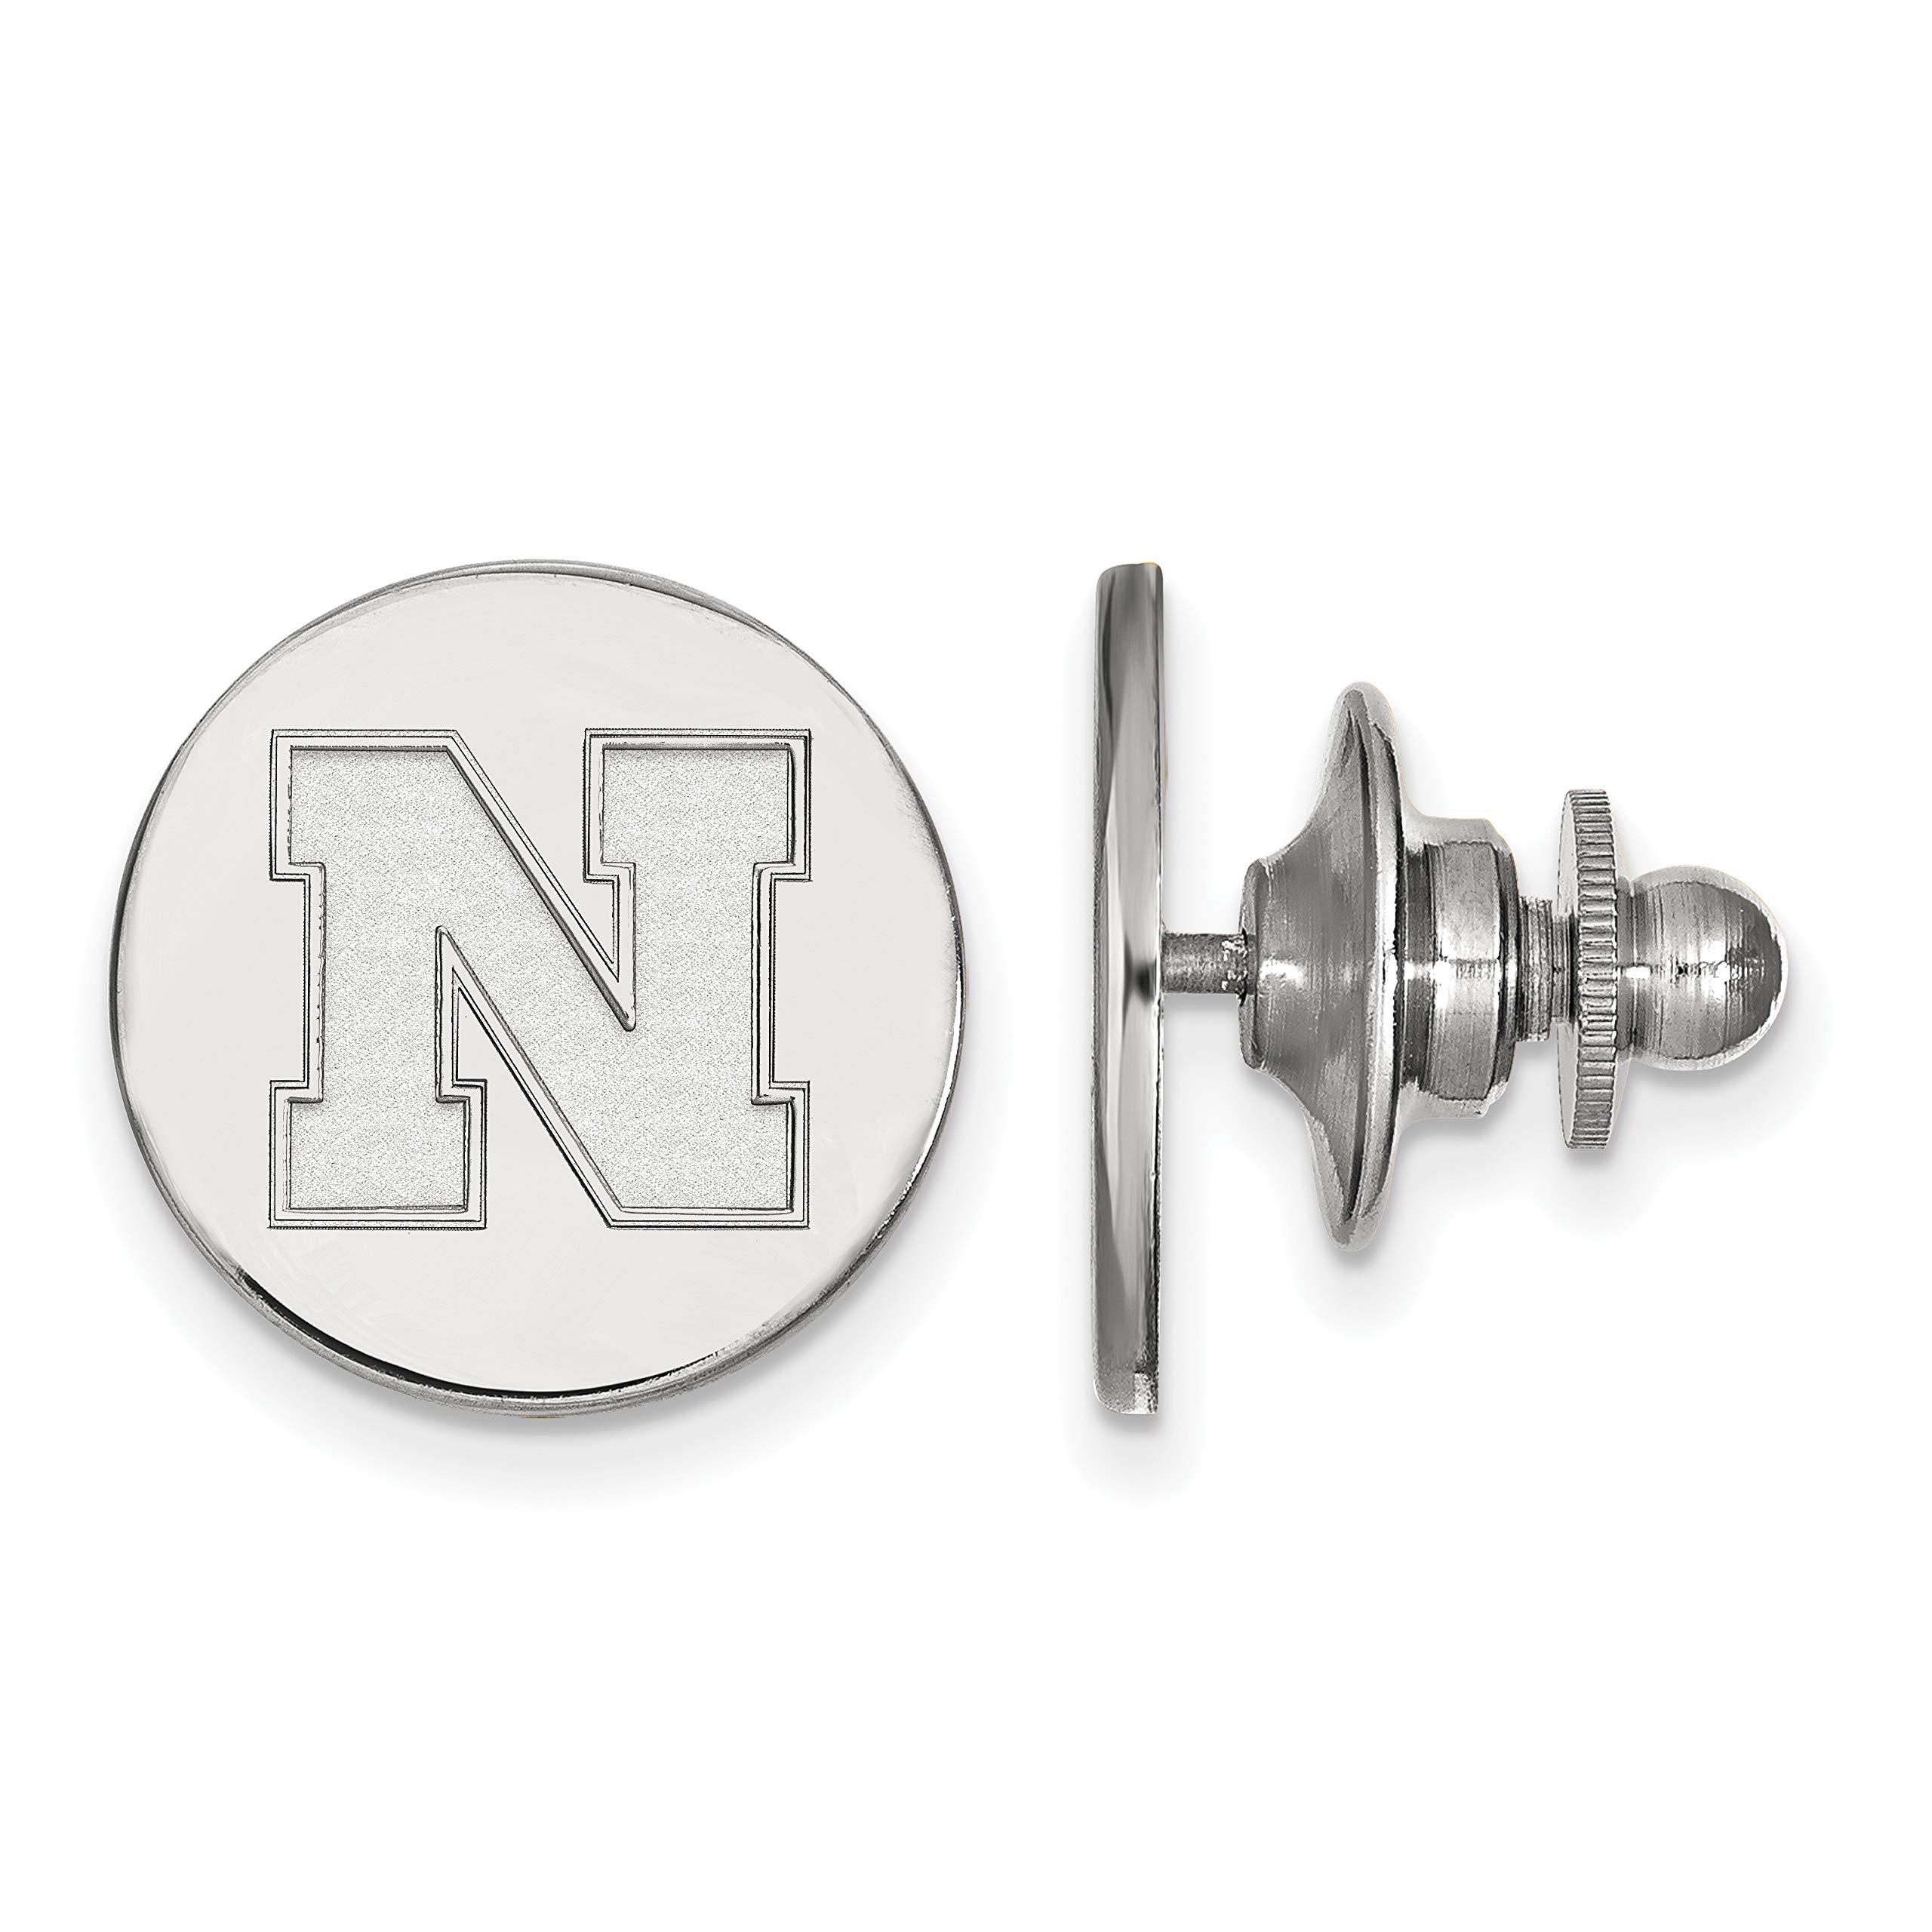 University of Nebraska Cornhuskers School Letter Lapel Pin in Sterling Silver 15x15mm by Jewelry Stores Network